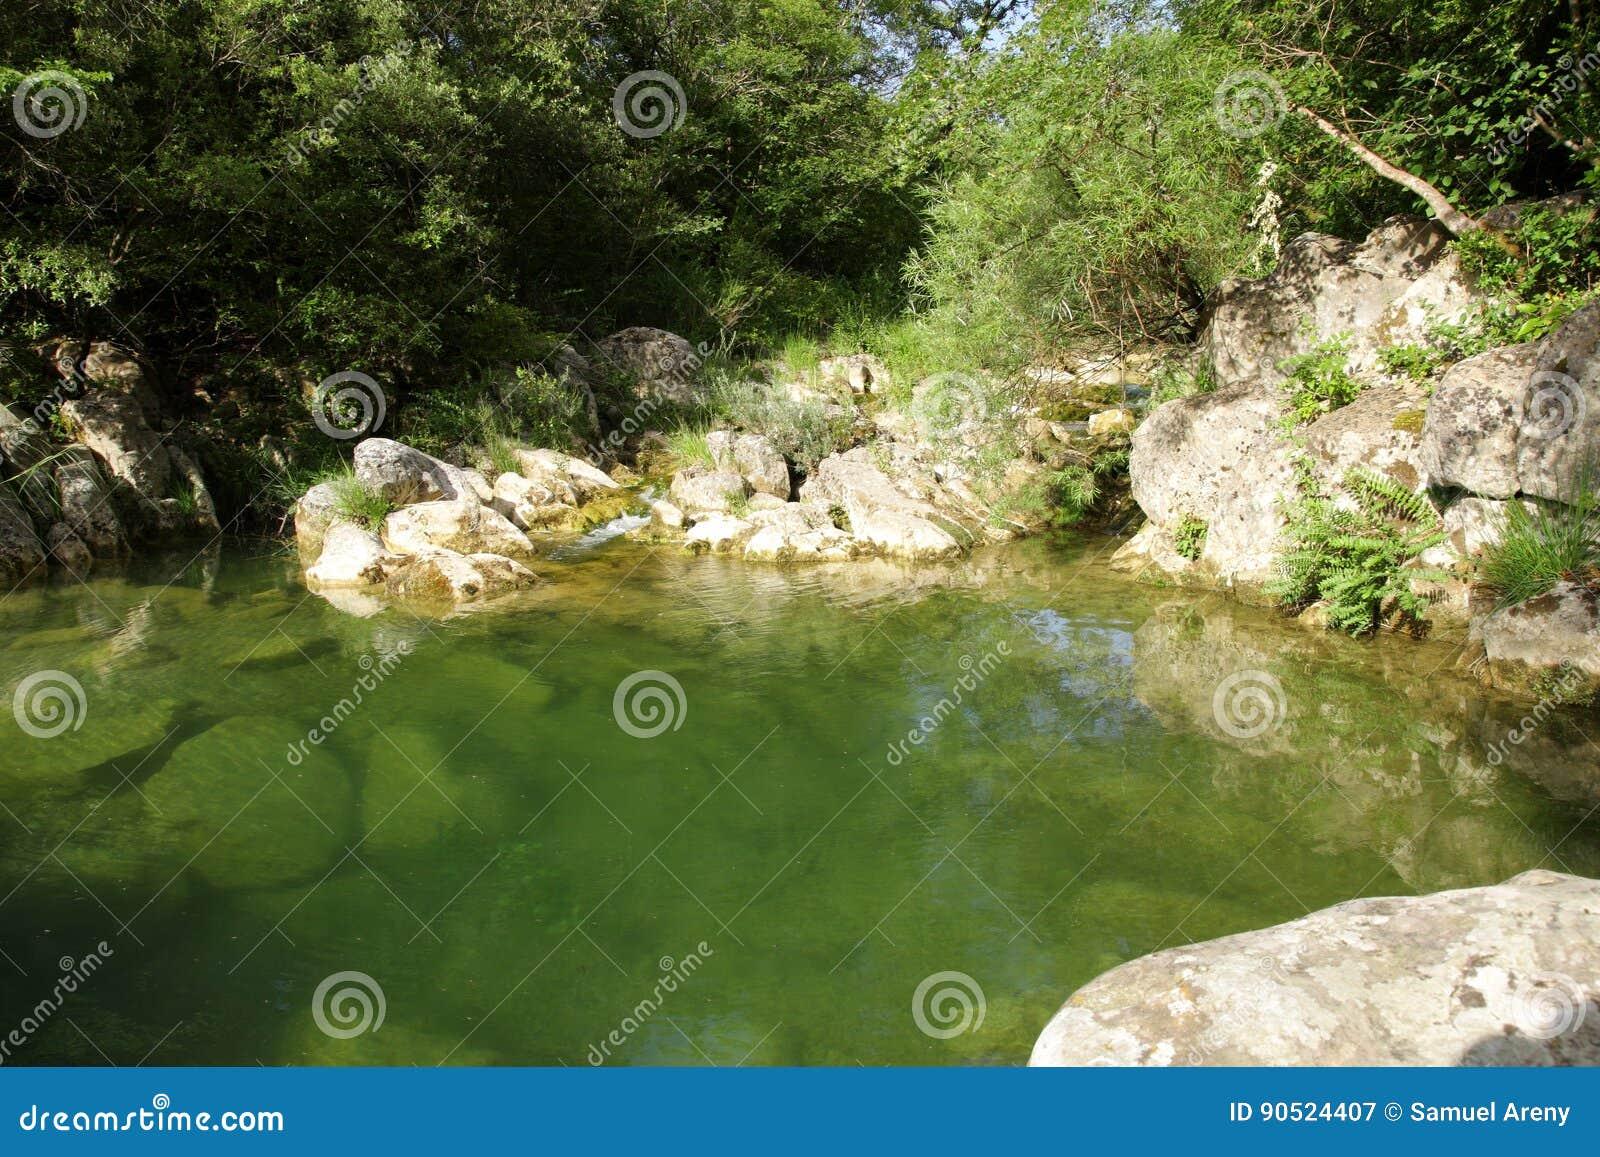 Fluss lauquet in Corbieres, Frankreich